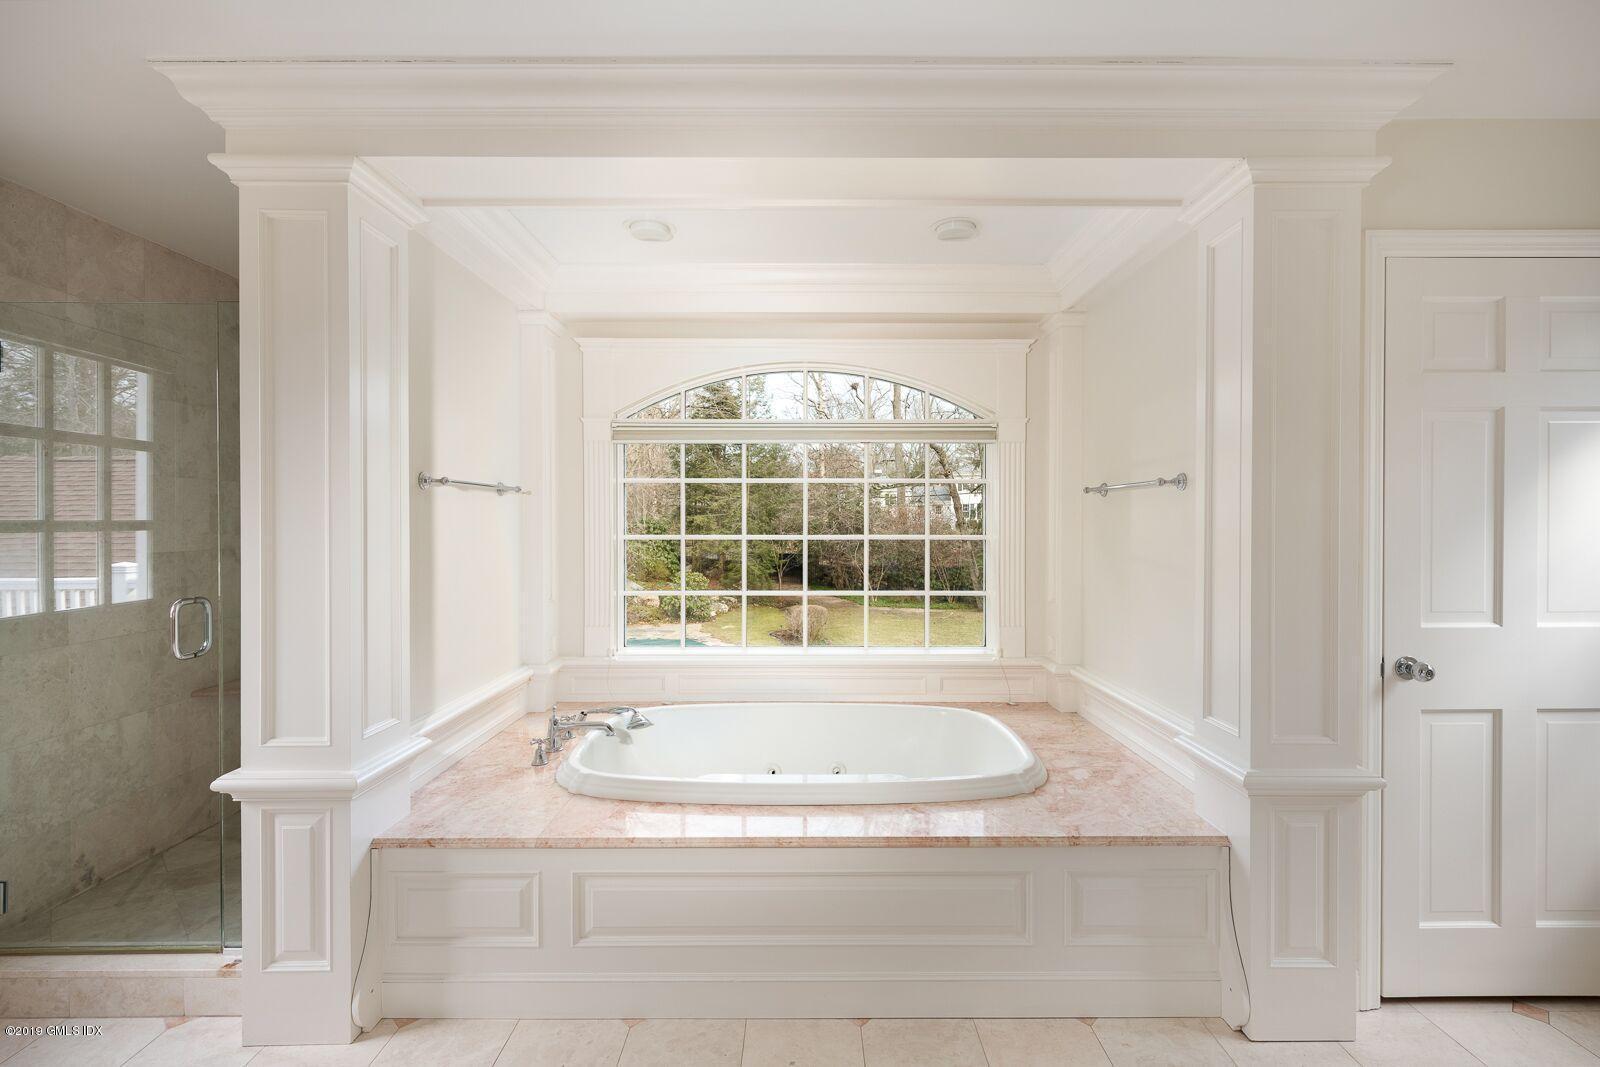 35 Copper Beech Road,Greenwich,Connecticut 06830,4 Bedrooms Bedrooms,3 BathroomsBathrooms,Single family,Copper Beech,105441